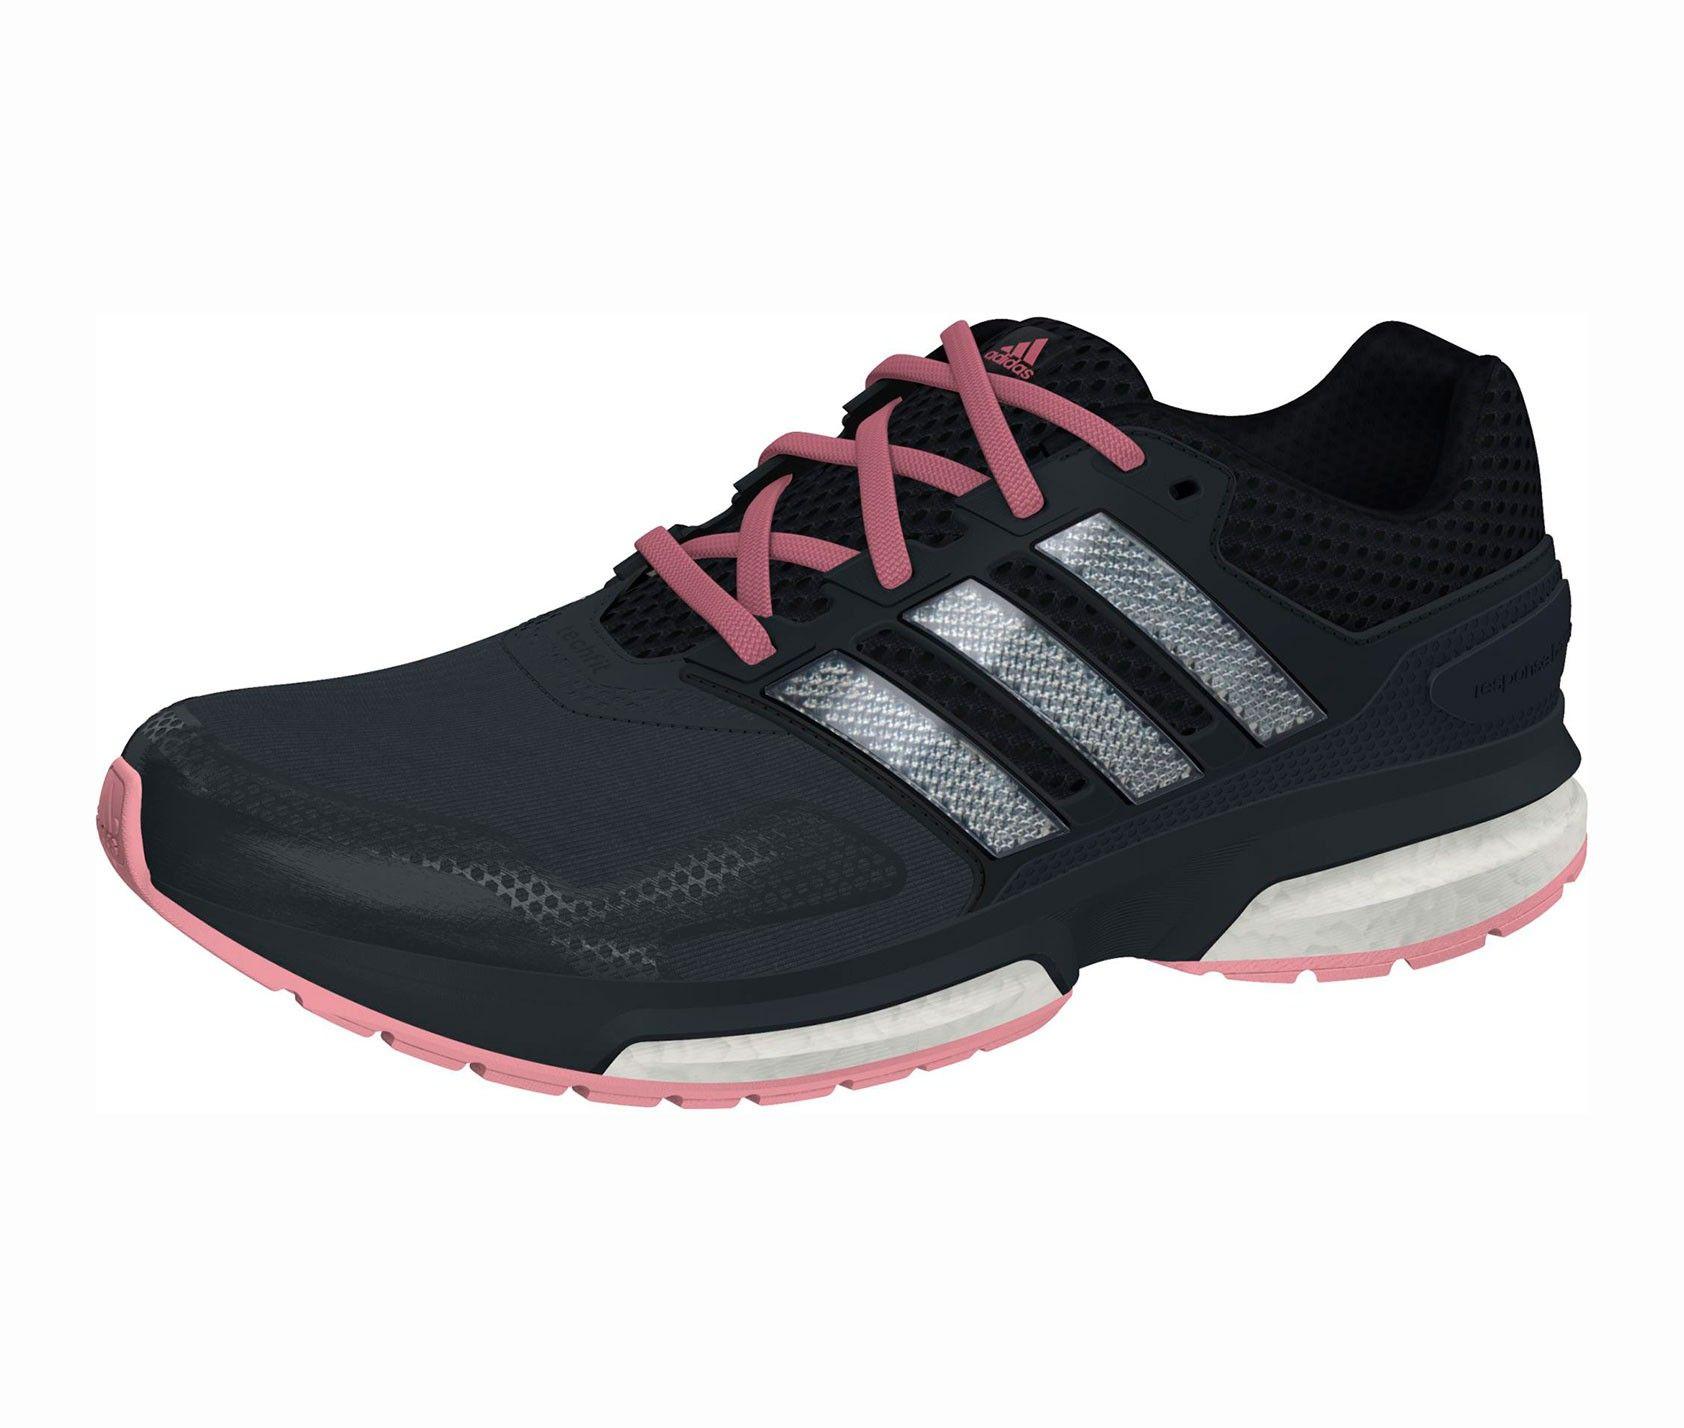 Zapatillas adidas Supernova negro rosa mujer premier fashion